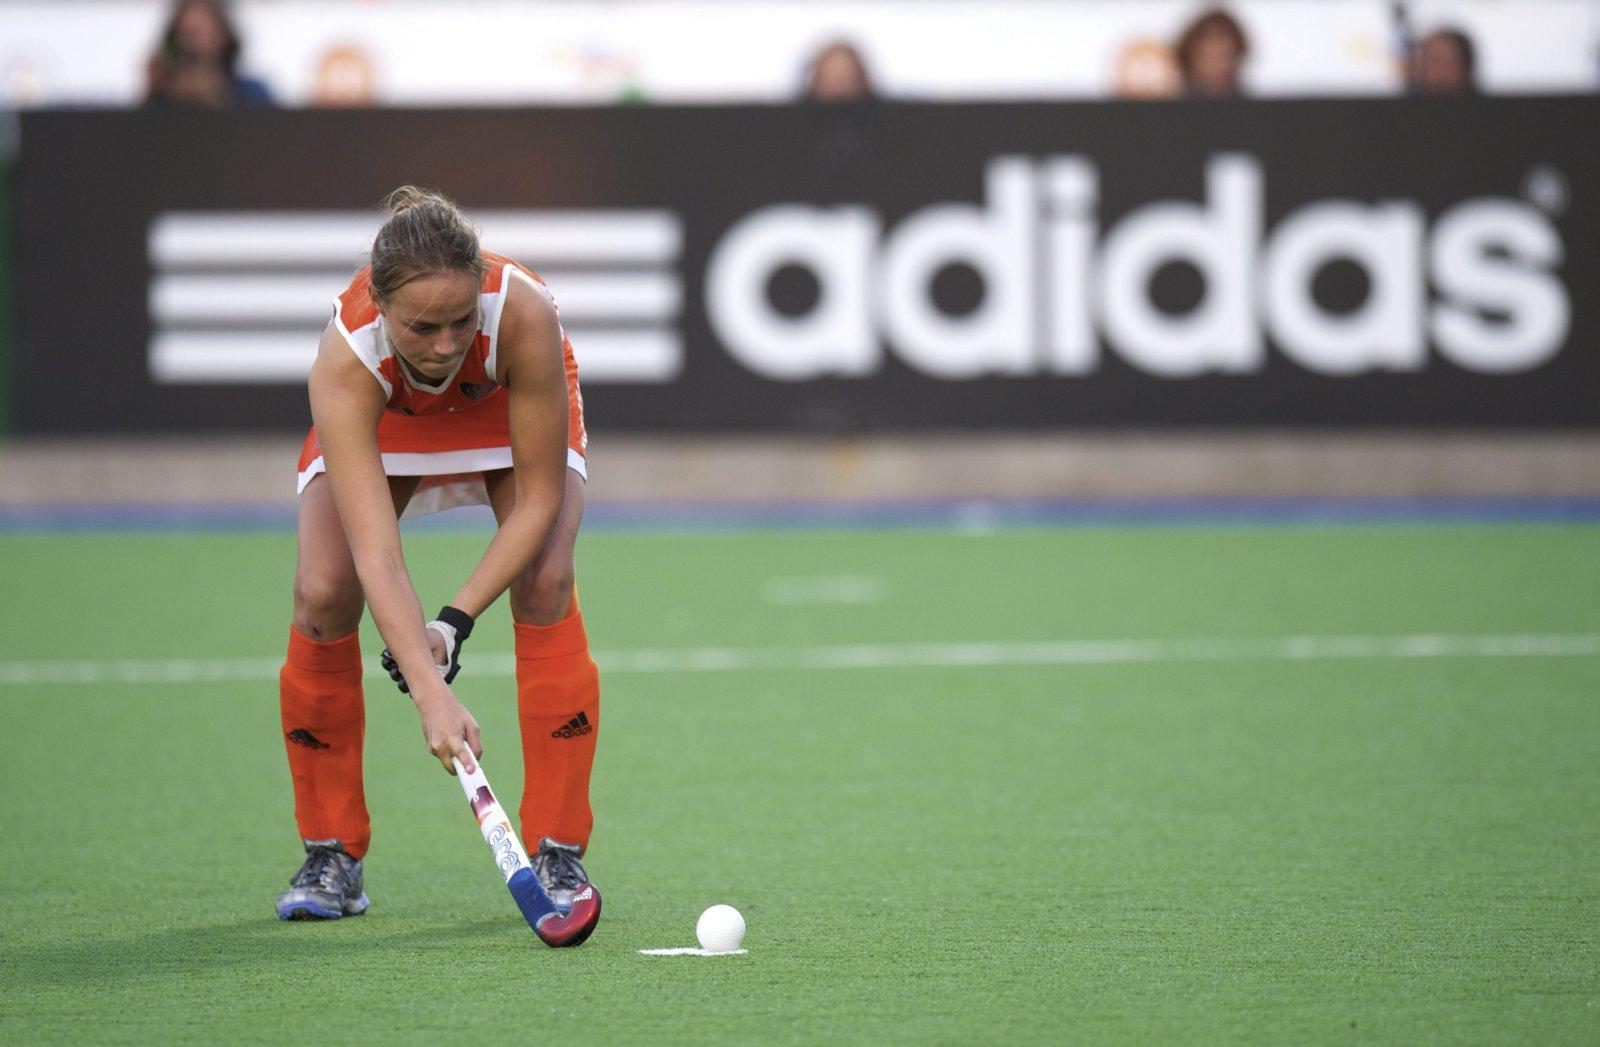 Maartje Paumen - Hockey.nl